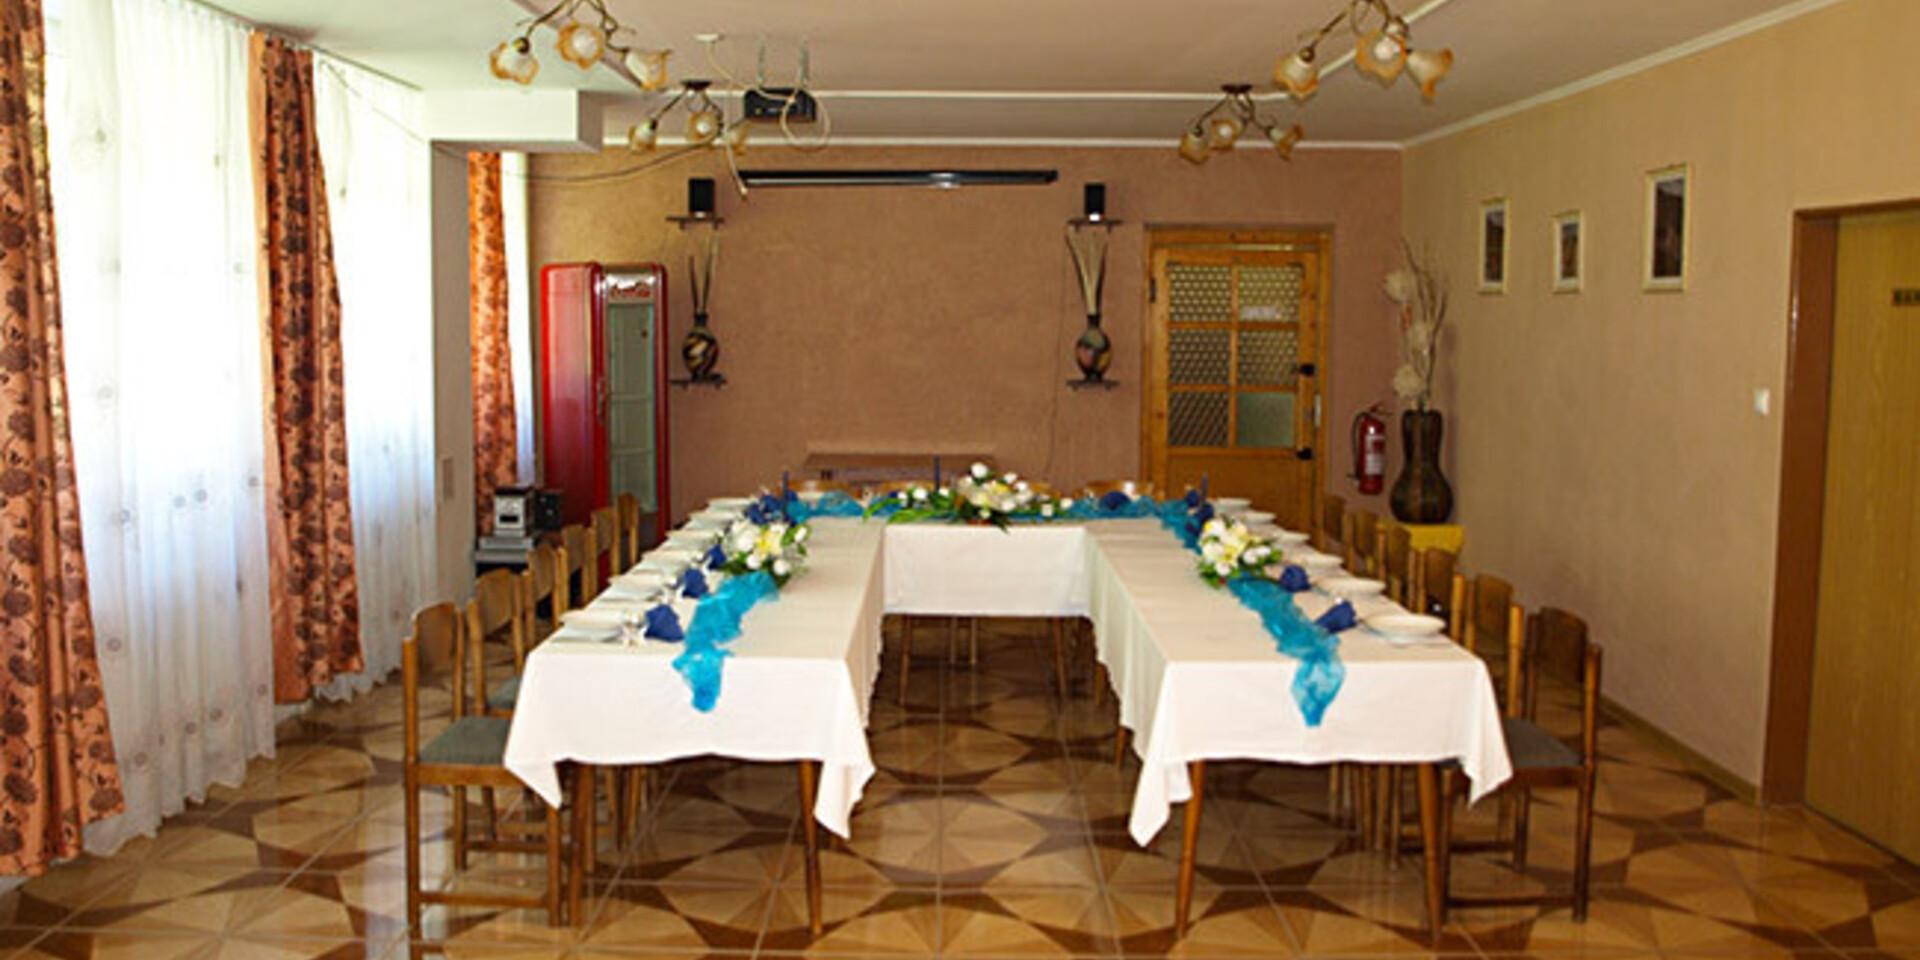 Dovolenka s raňajkami v kráľovskom banskom meste Kremnica + ubytov...